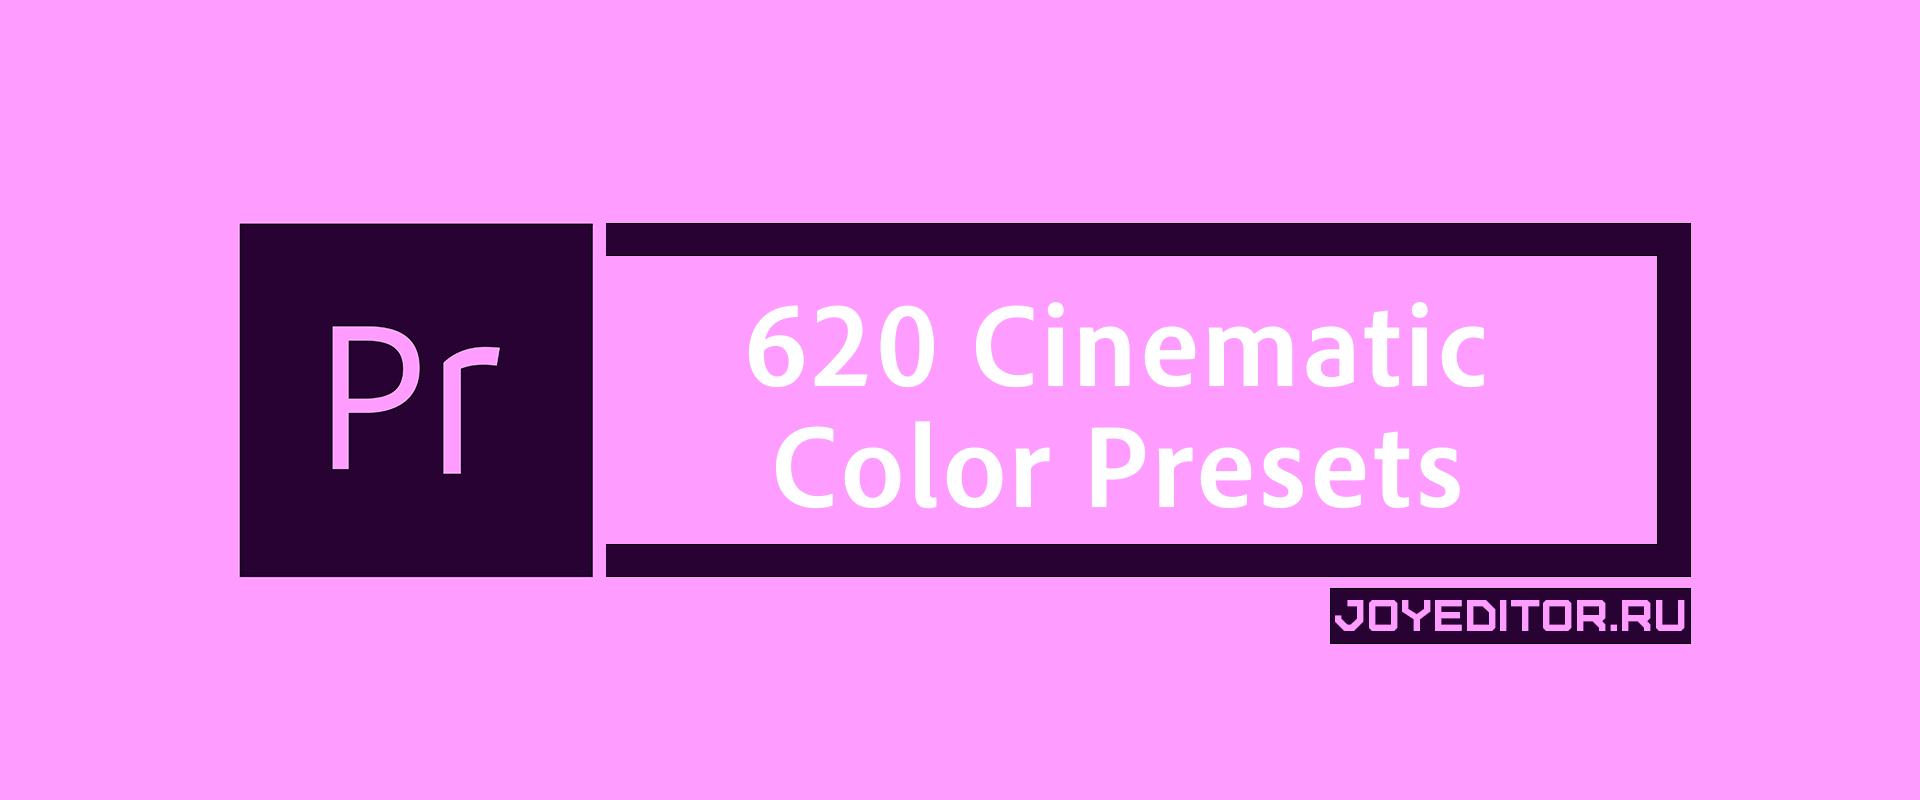 620 Cinematic Color Presets